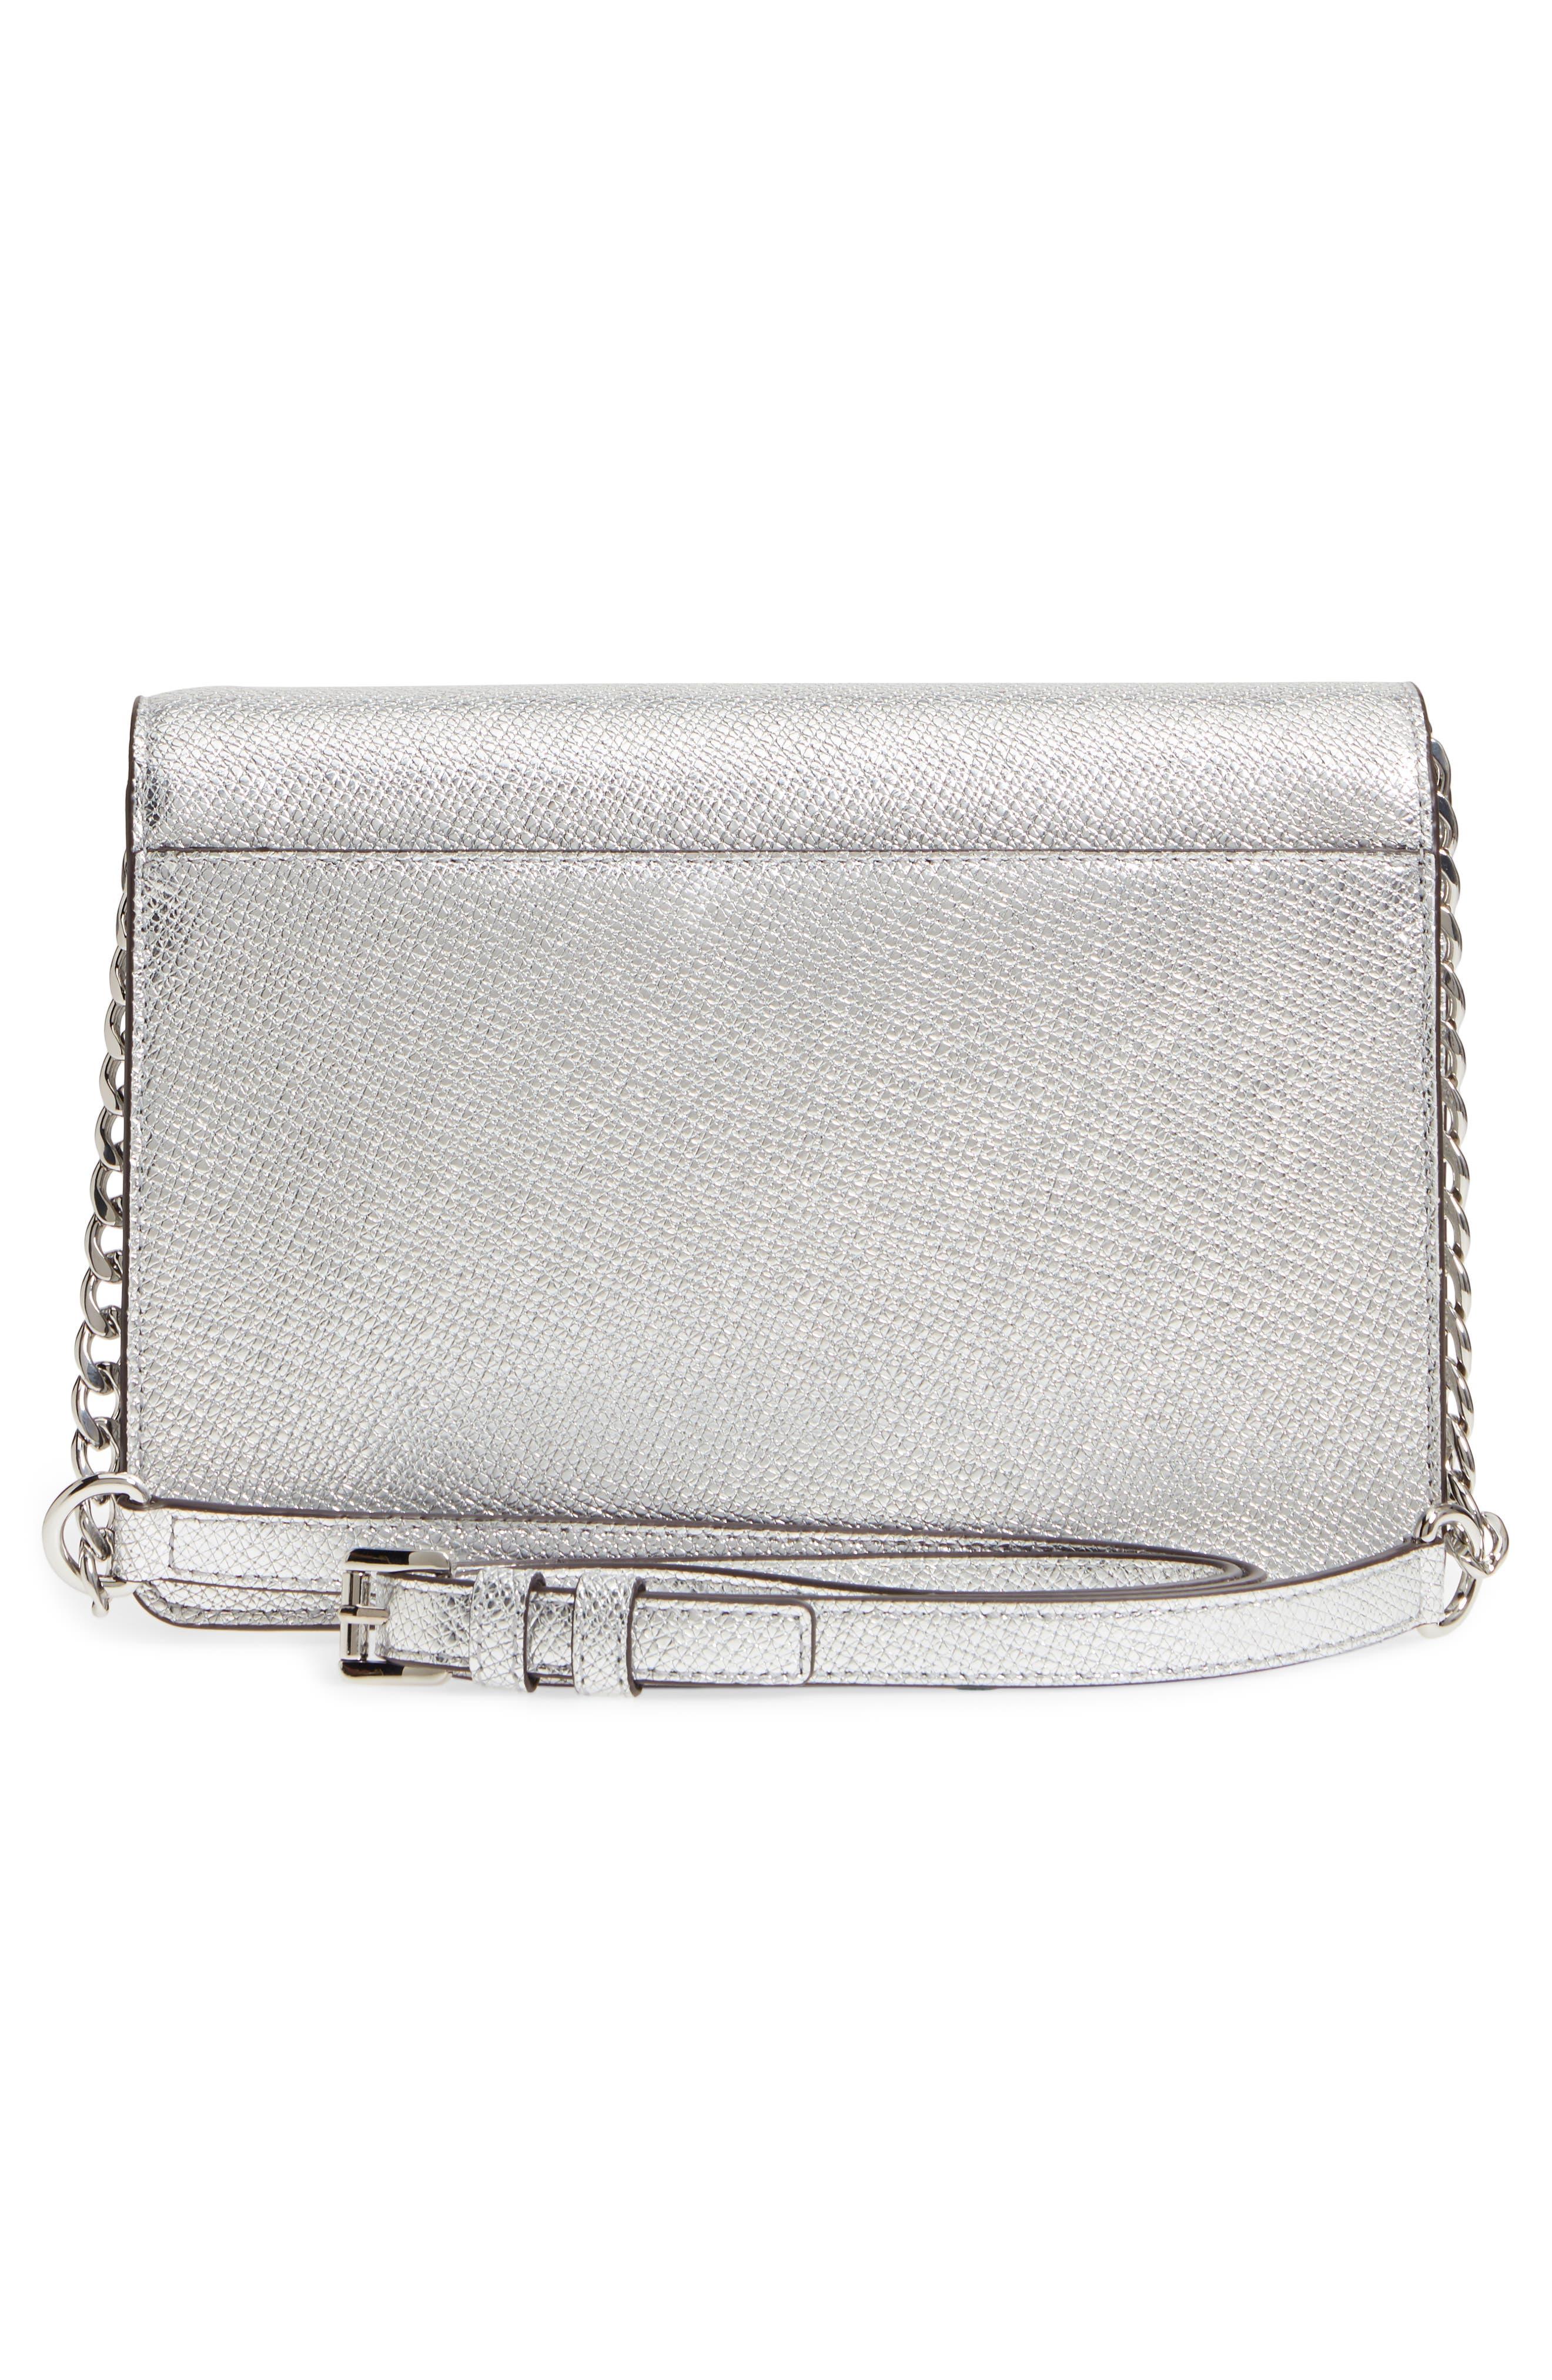 MICHAEL Michael Kors Large Metallic Leather Crossbody Bag,                             Alternate thumbnail 3, color,                             Silver